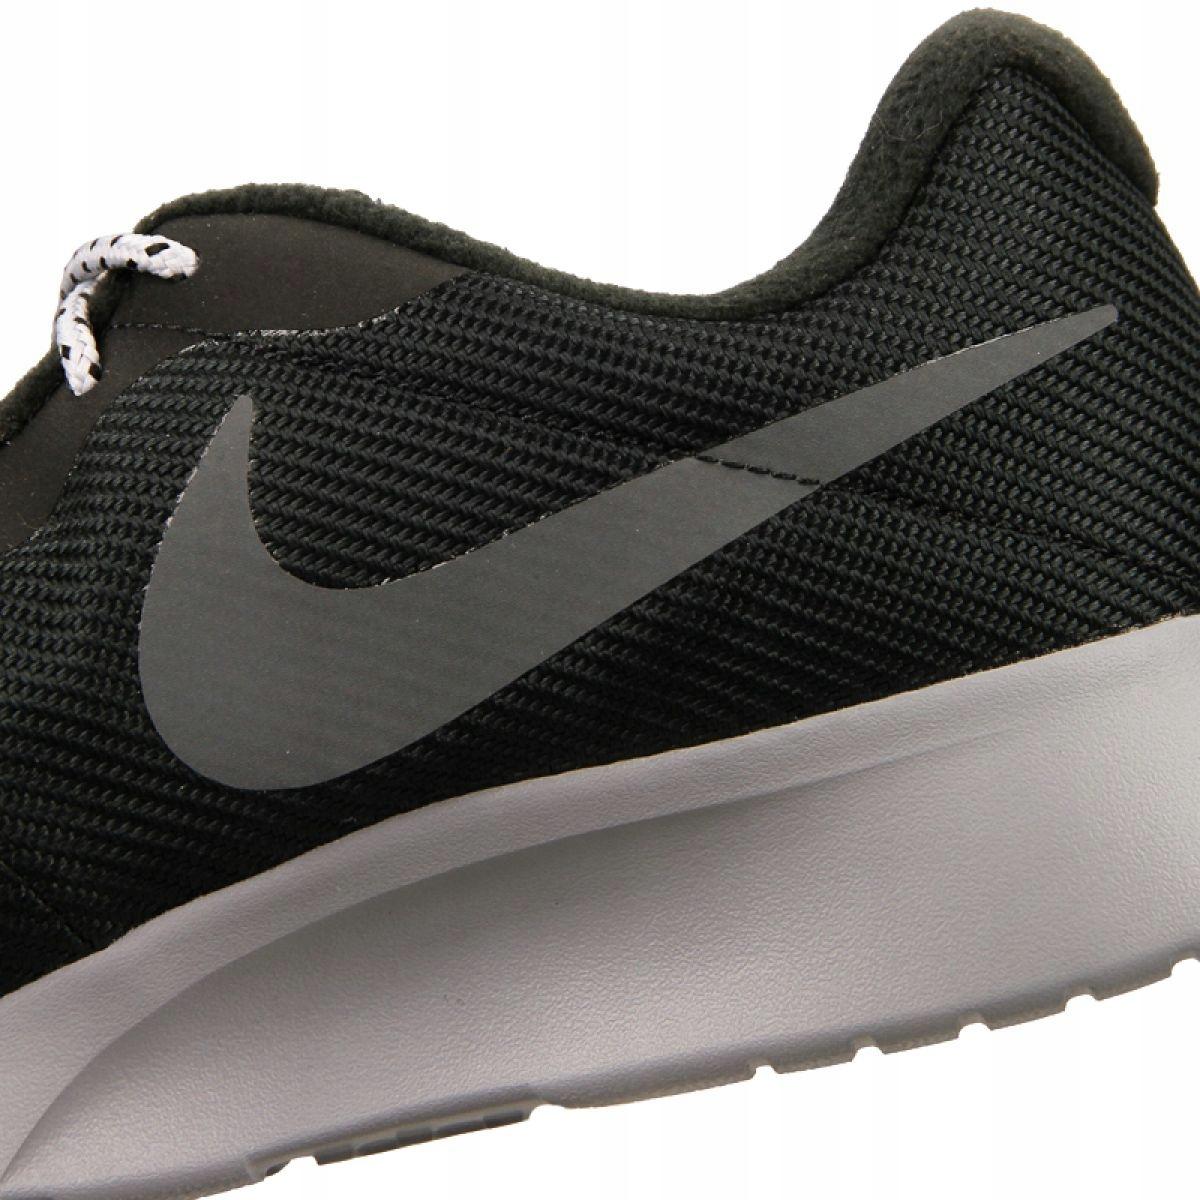 Sapatilhas Nike Tanjun Se M AR1941 005 preto